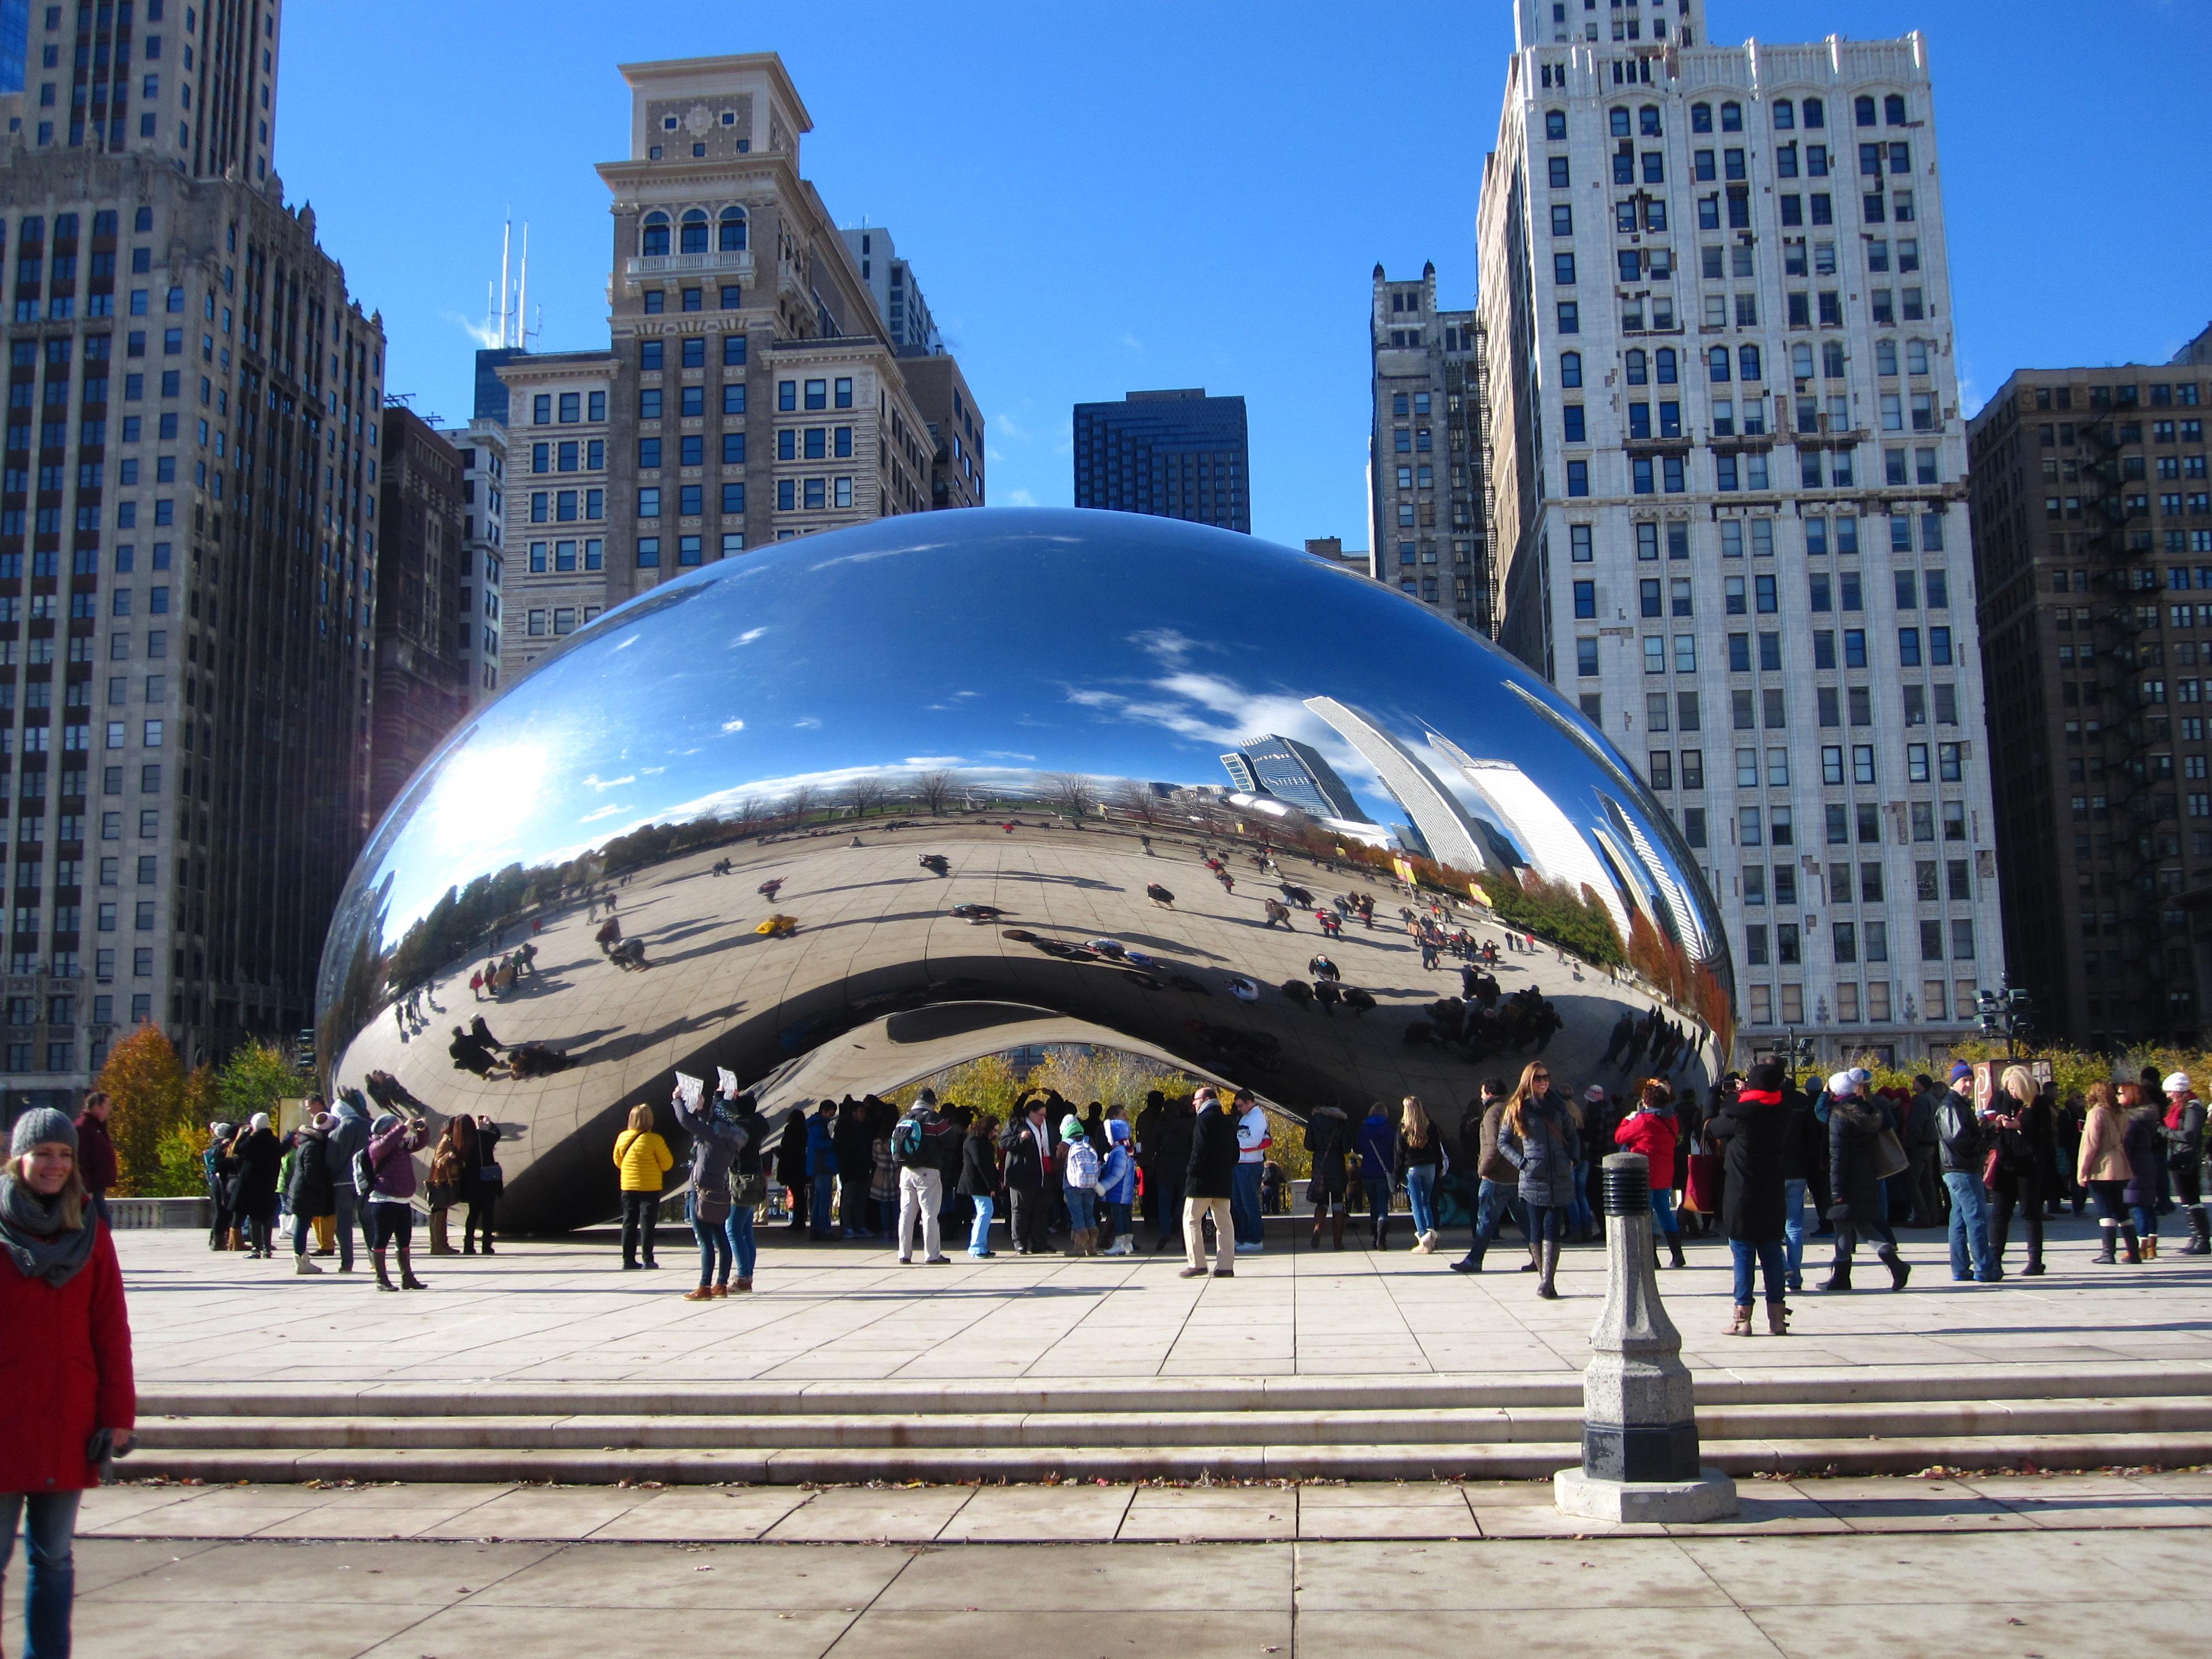 01_CHICAGO_ART_ANISH_KAPOOR_CLOUD_GATE